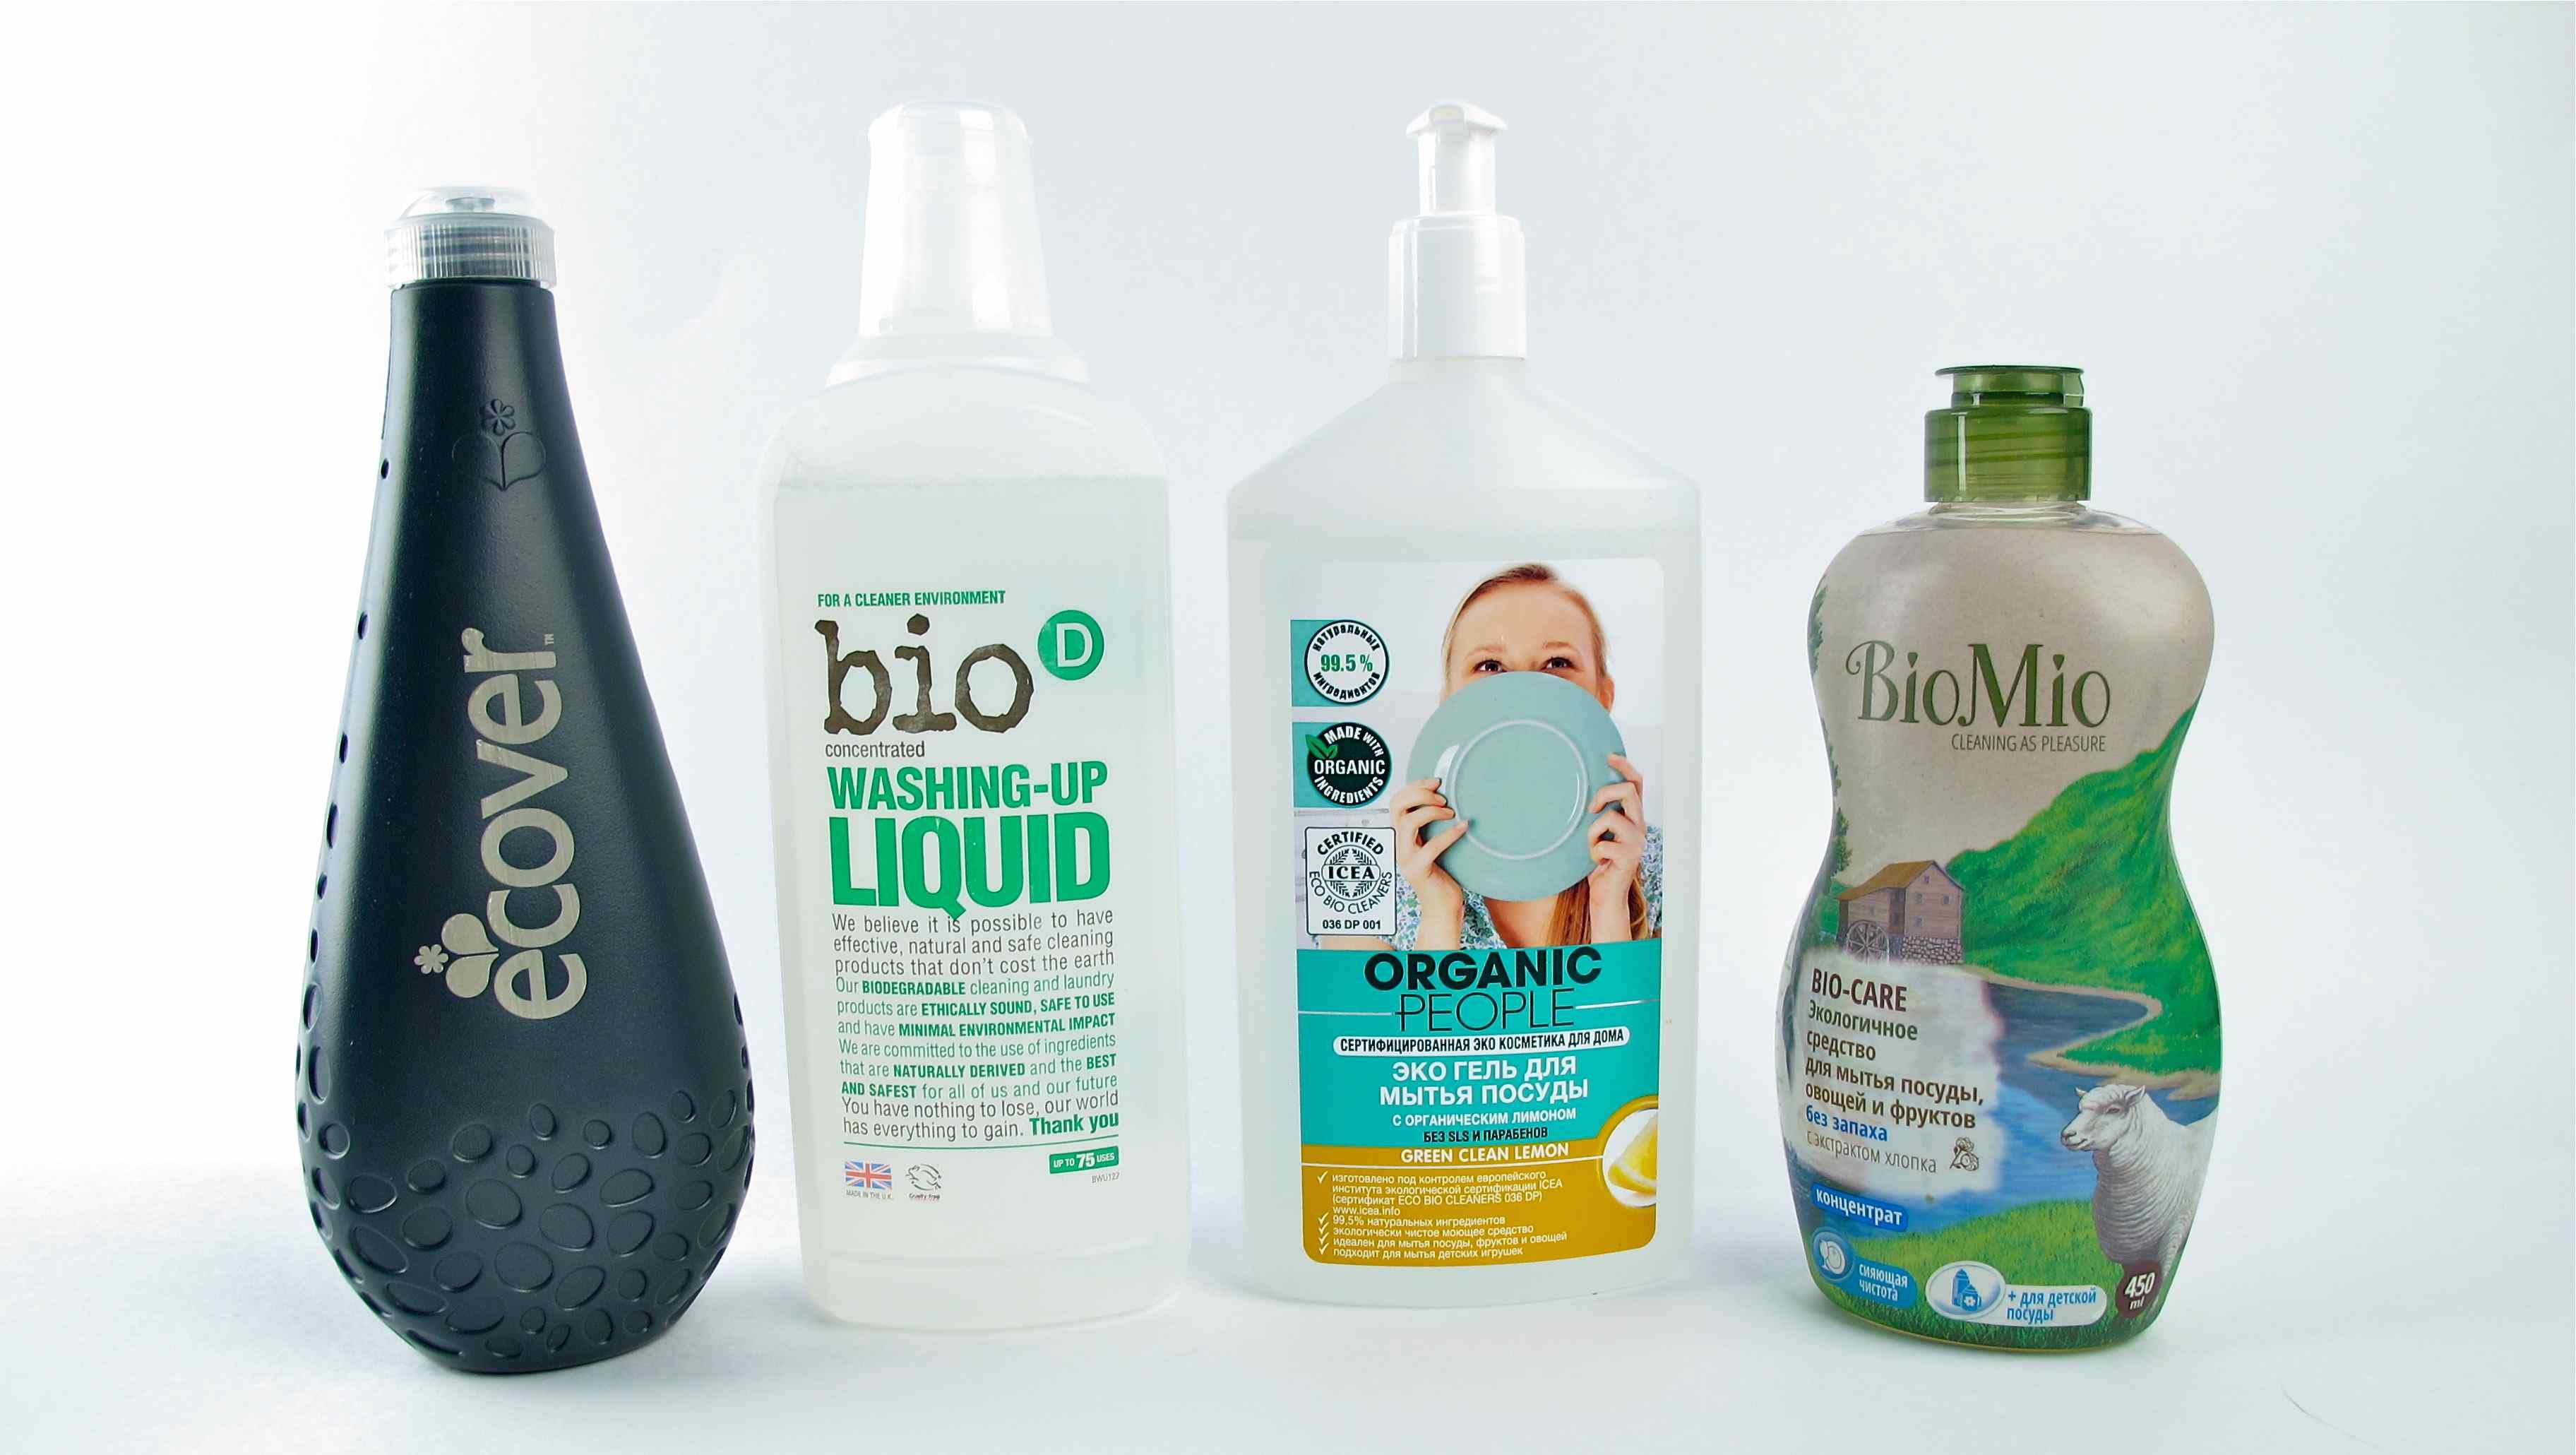 All dish washing liquids Ecover Bio D Organic People Bio Mio